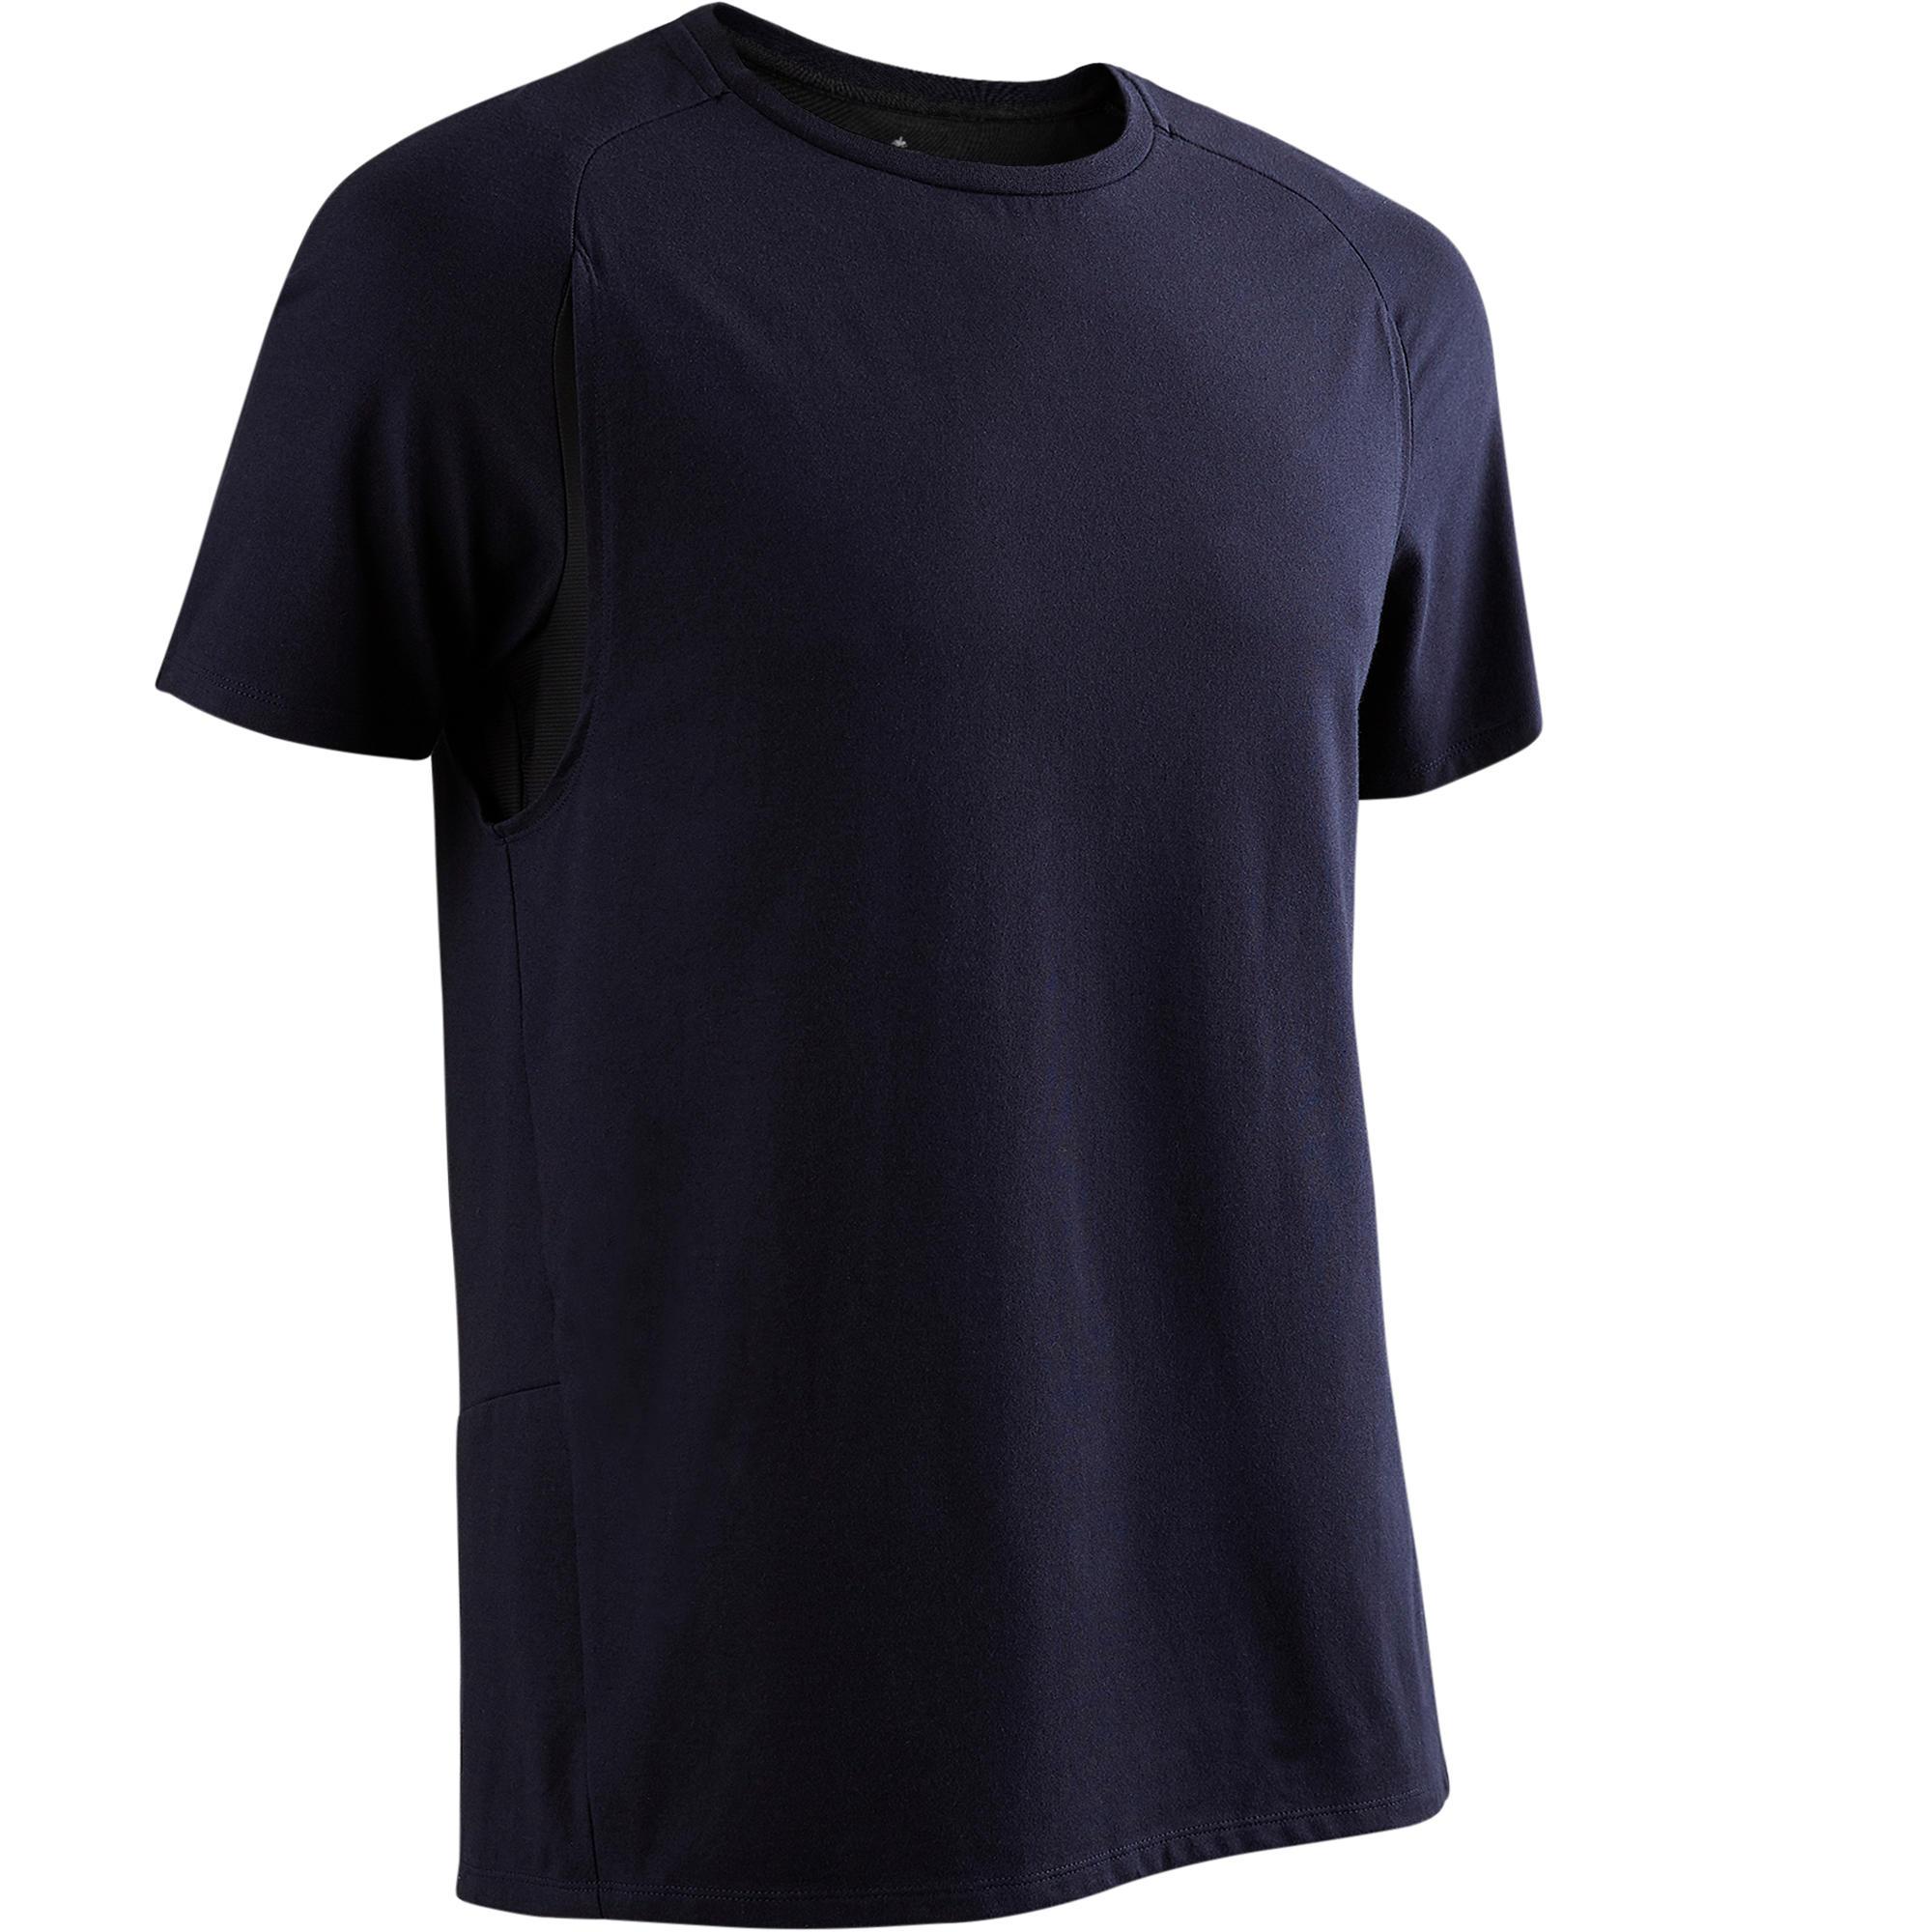 T-Shirt 540 Free Move Gym & Pilates Herren marineblau | Sportbekleidung > Sportshirts > Poloshirts | Blau - Schwarz | Domyos